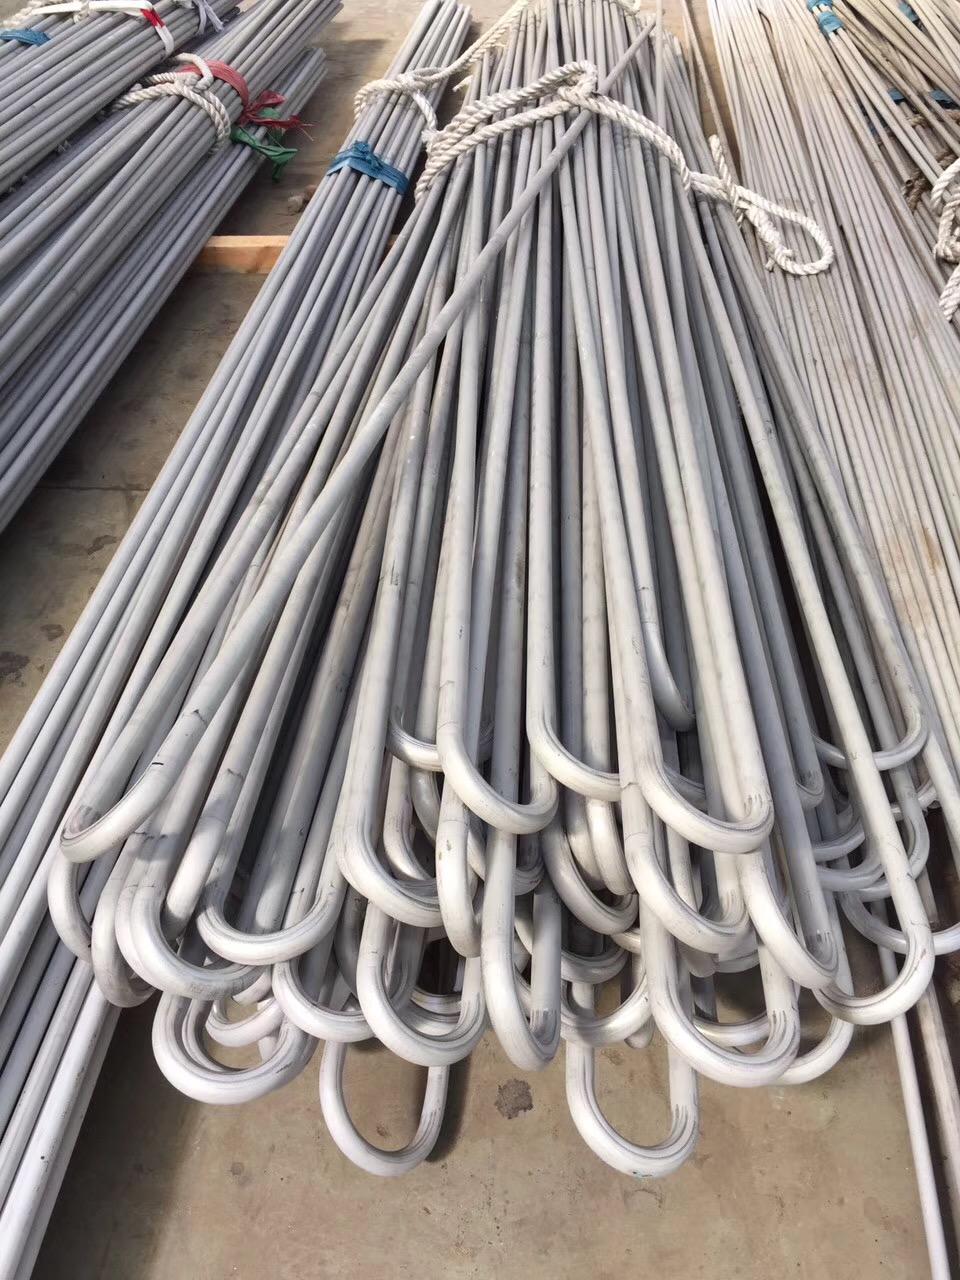 329外径不锈钢管SAF2205